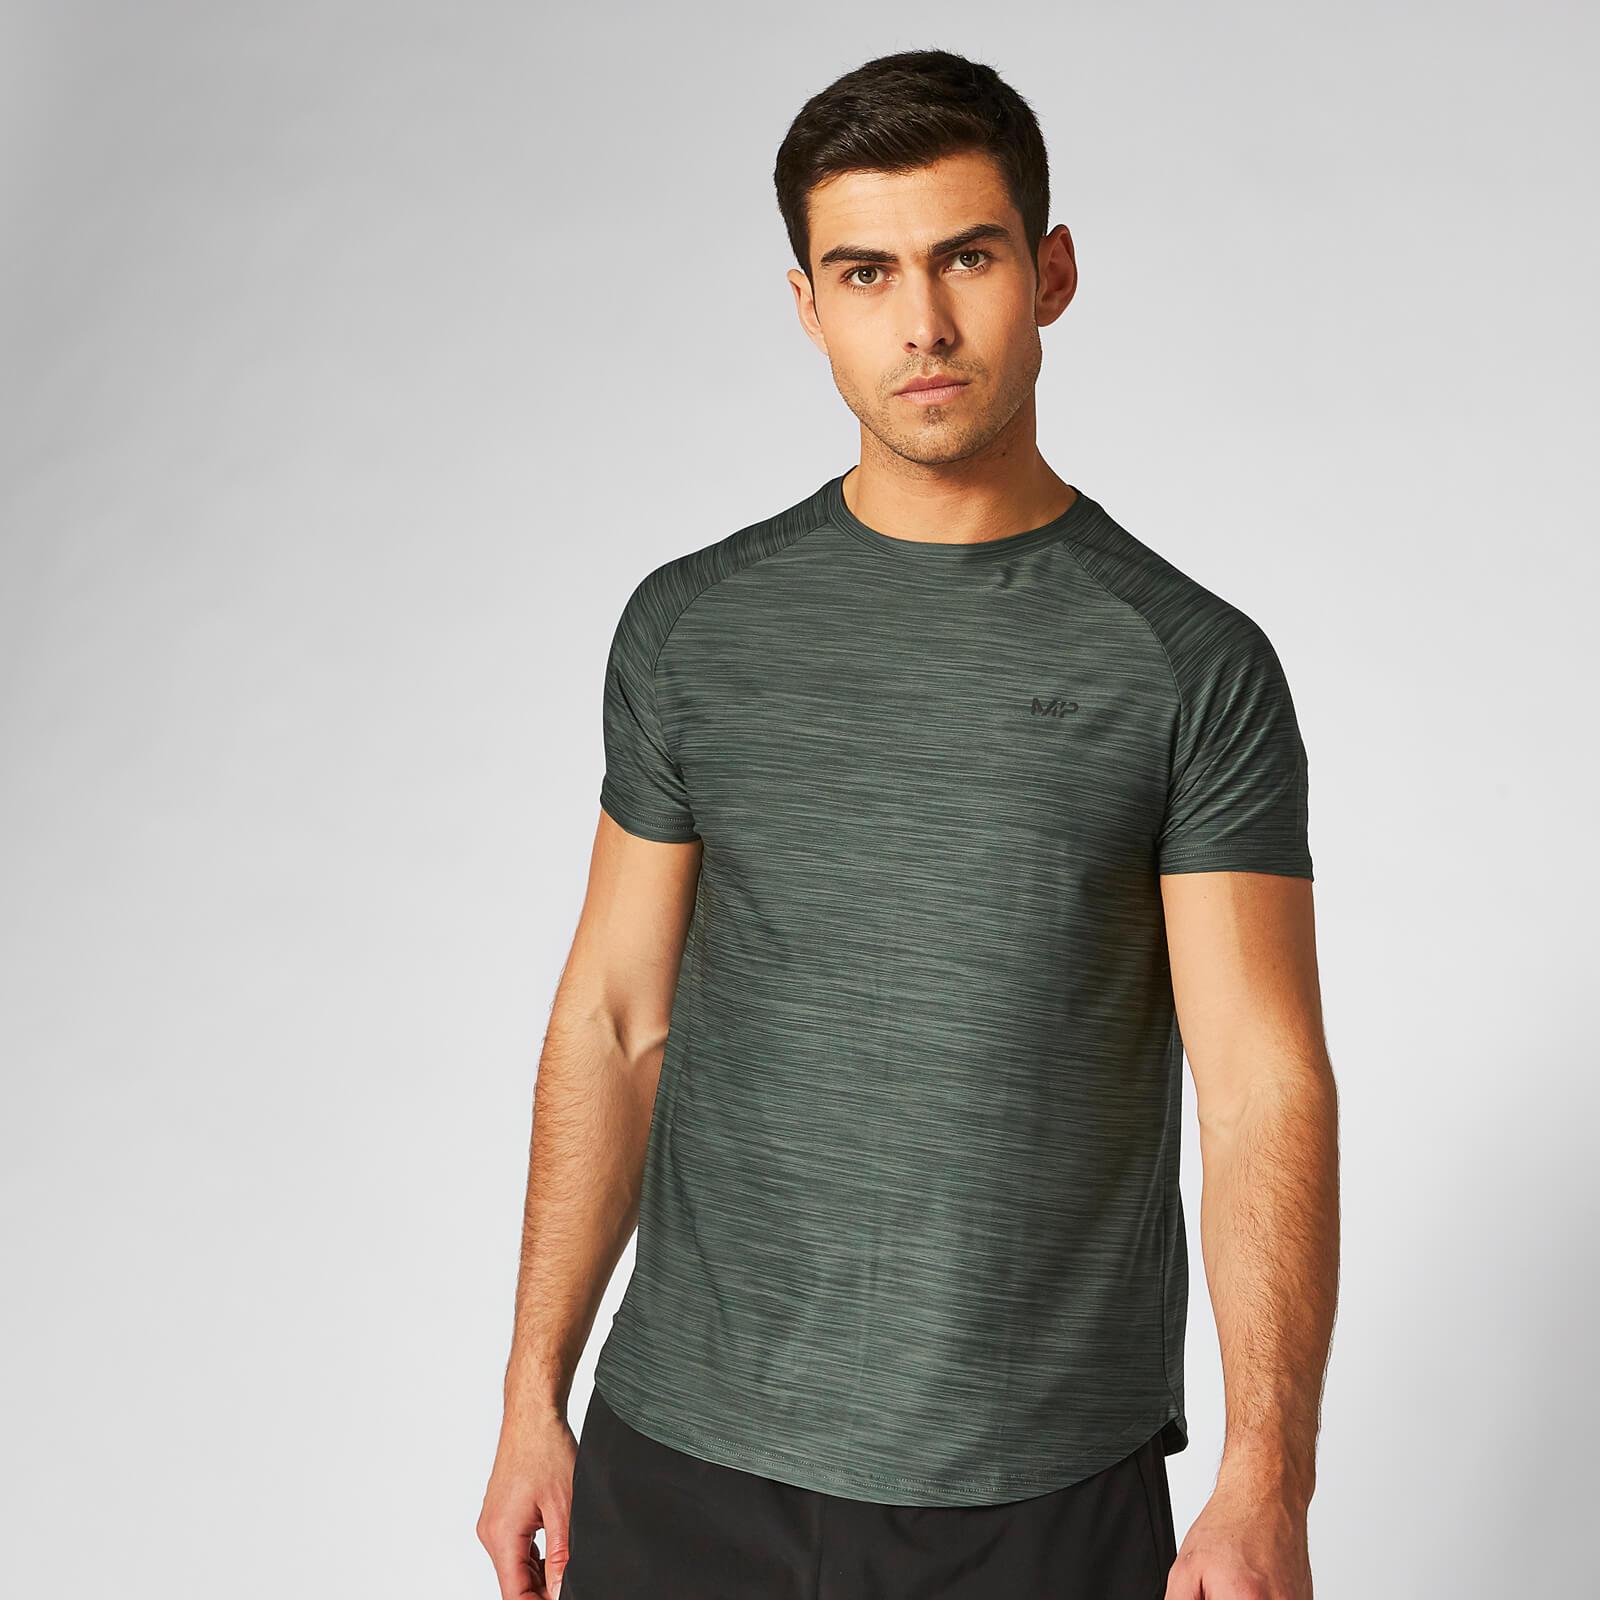 Myprotein Dry-Tech Infinity T-Shirt - Pine Marl - XS